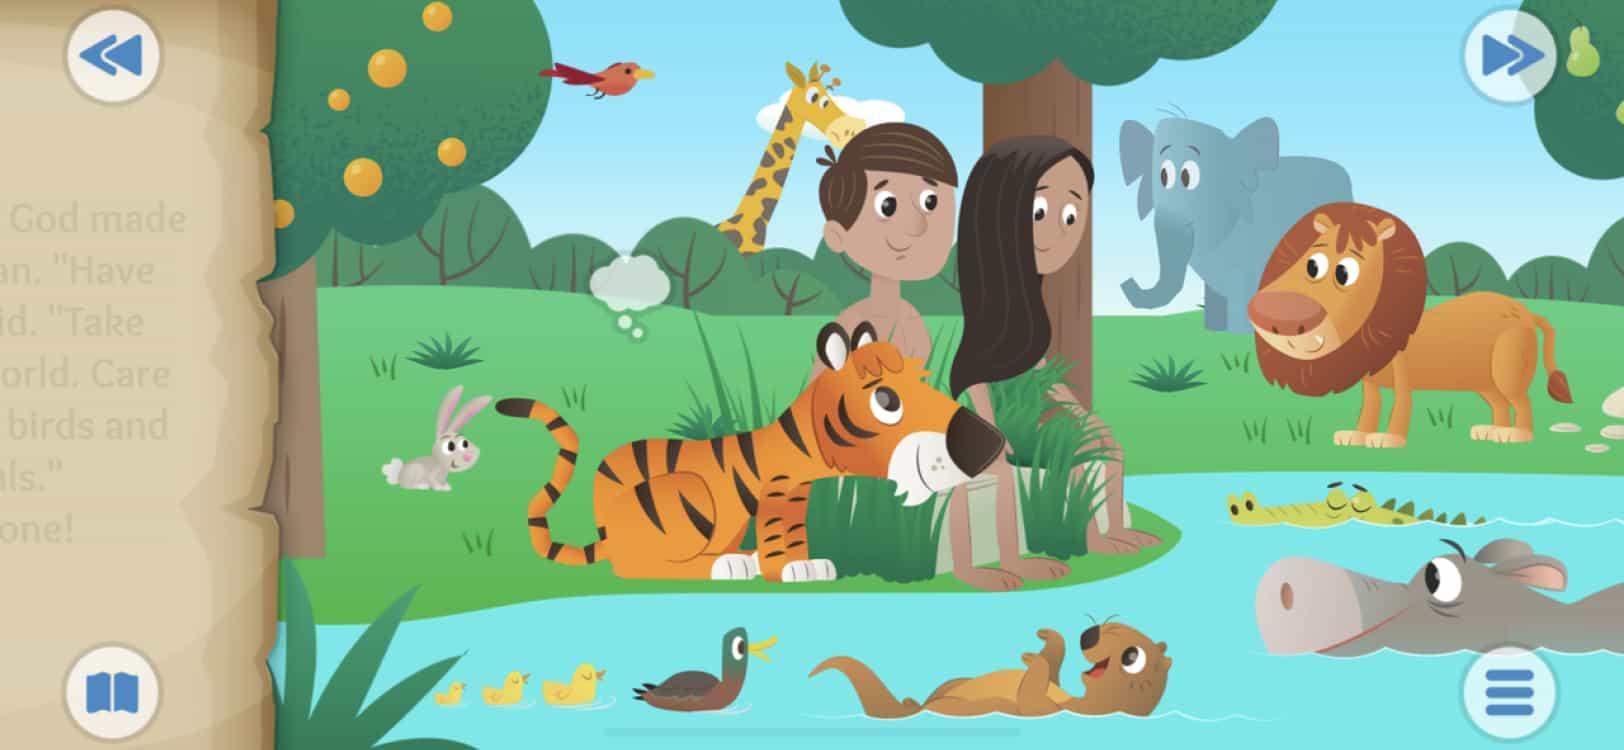 Bible App for Kids screenshot